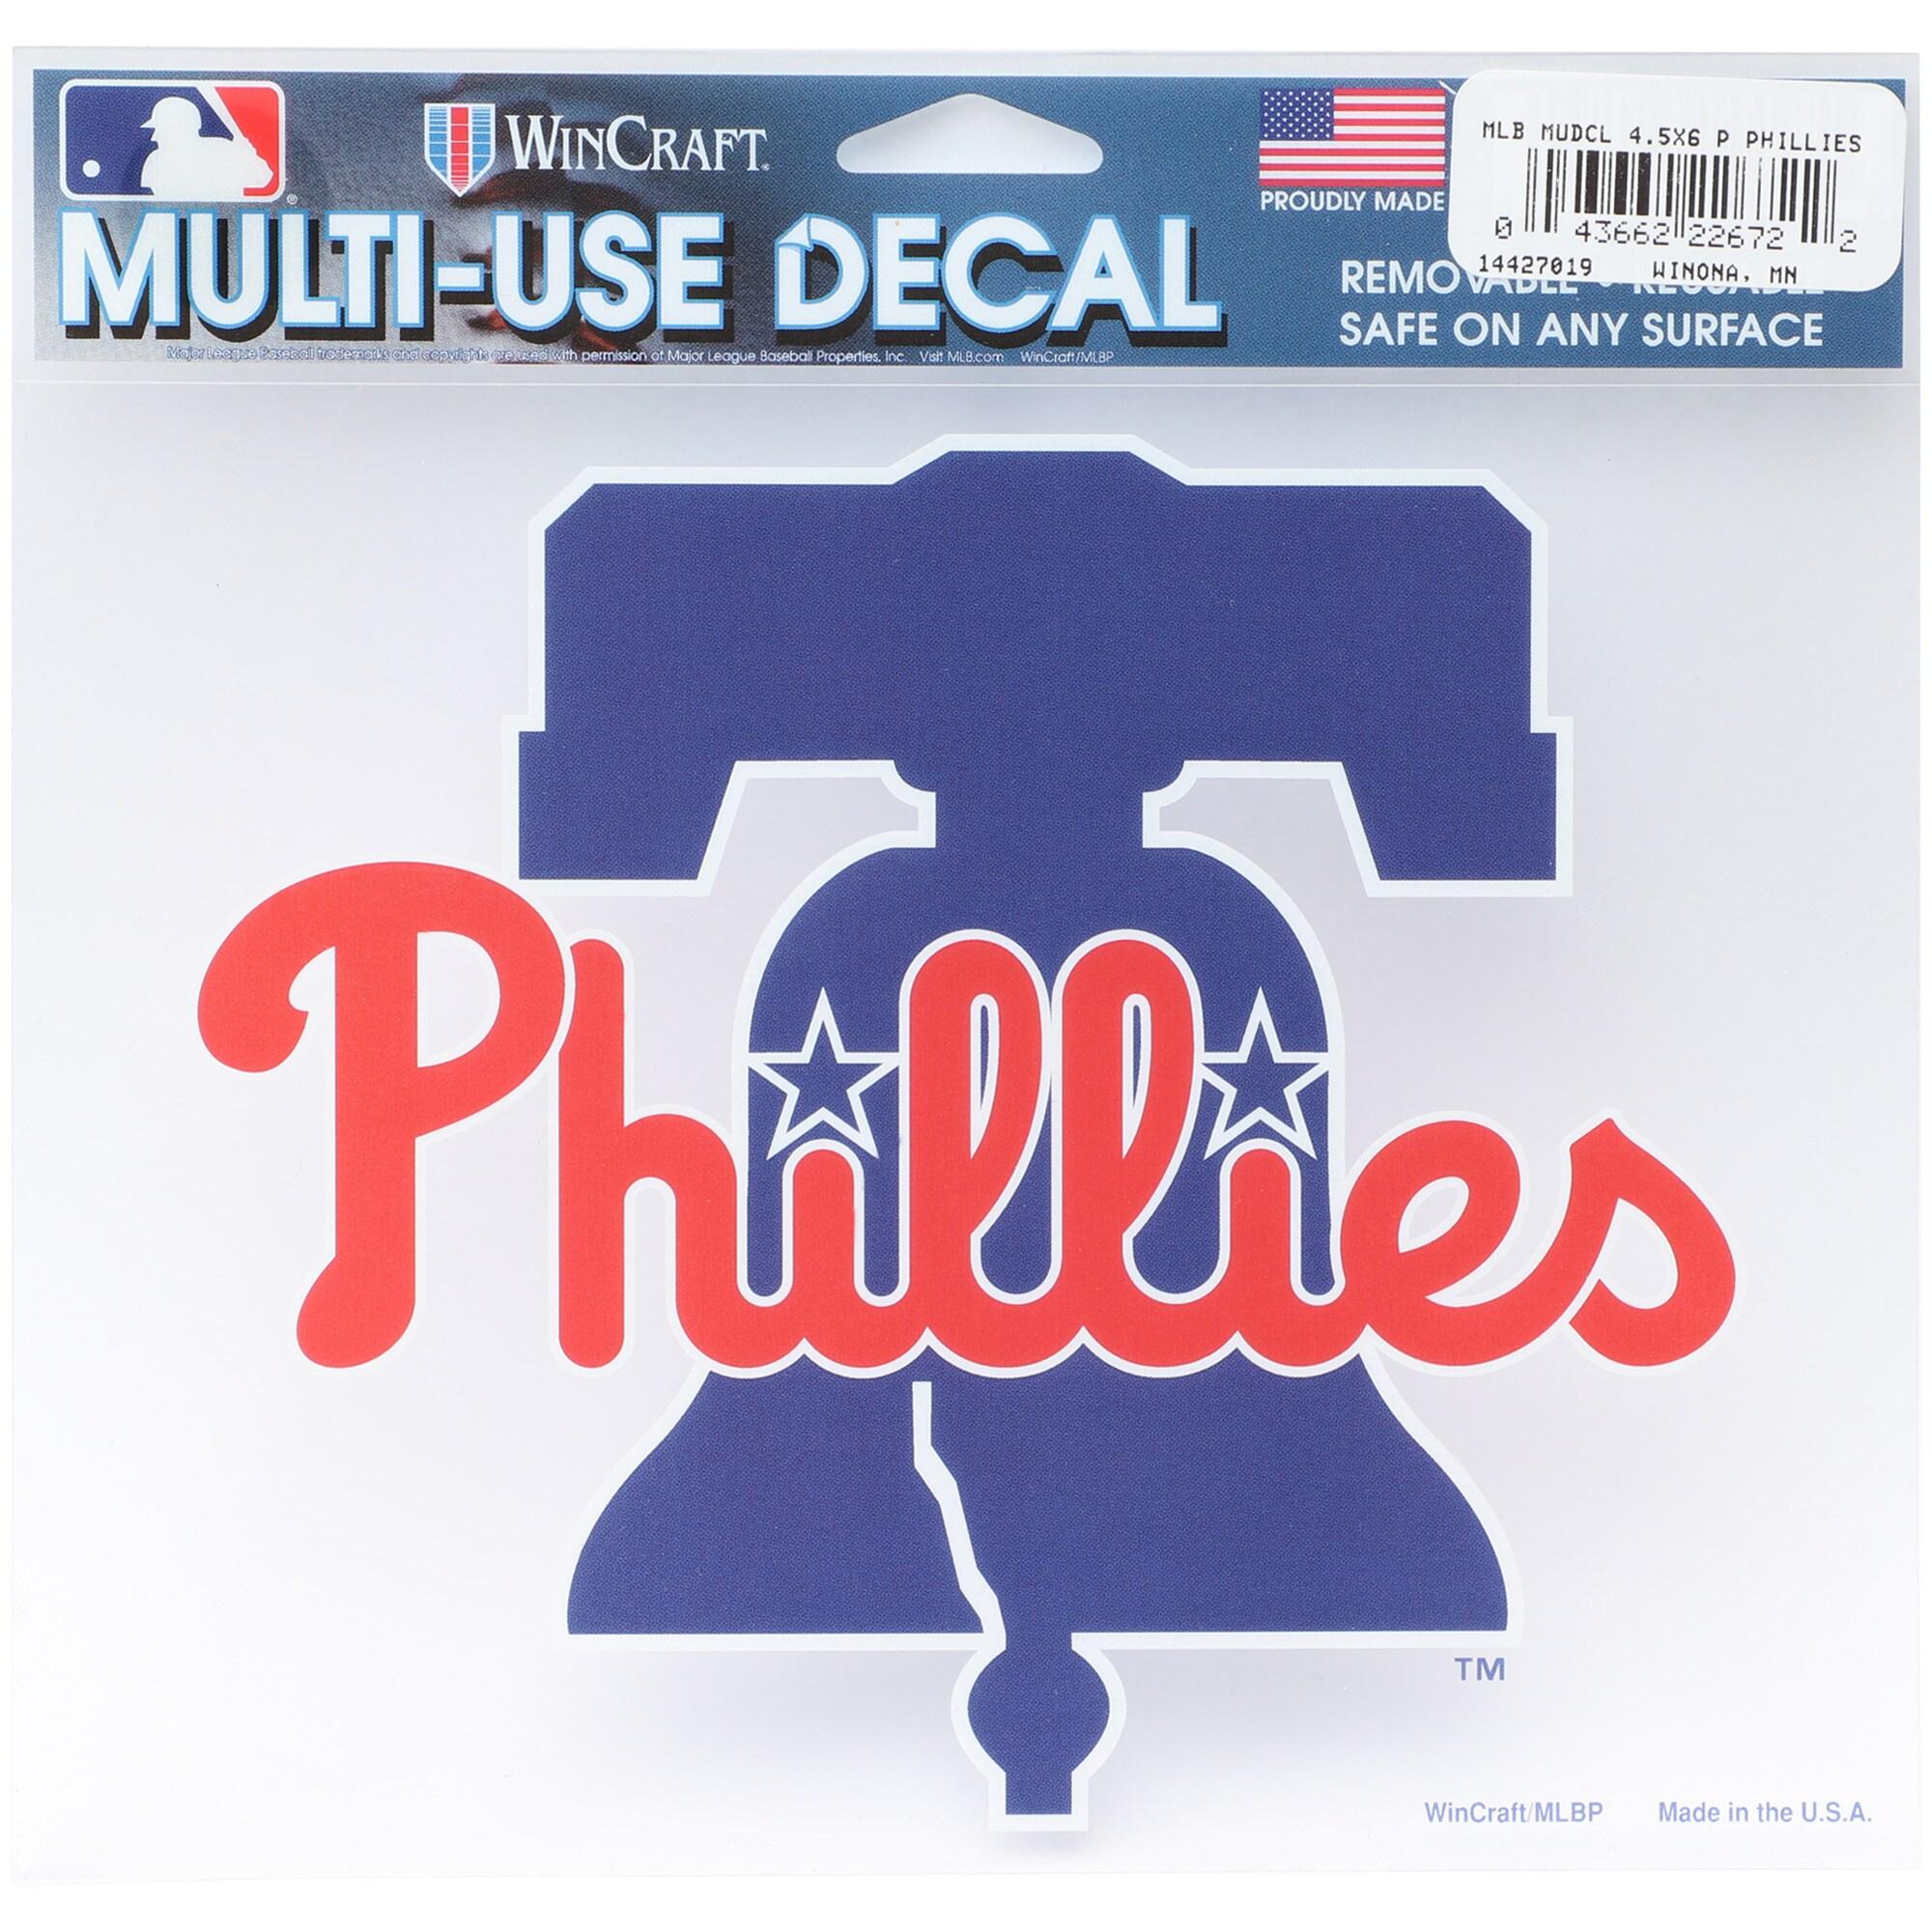 "Philadelphia Phillies WinCraft 5"" x 6"" Multi-Use Bell Decal"